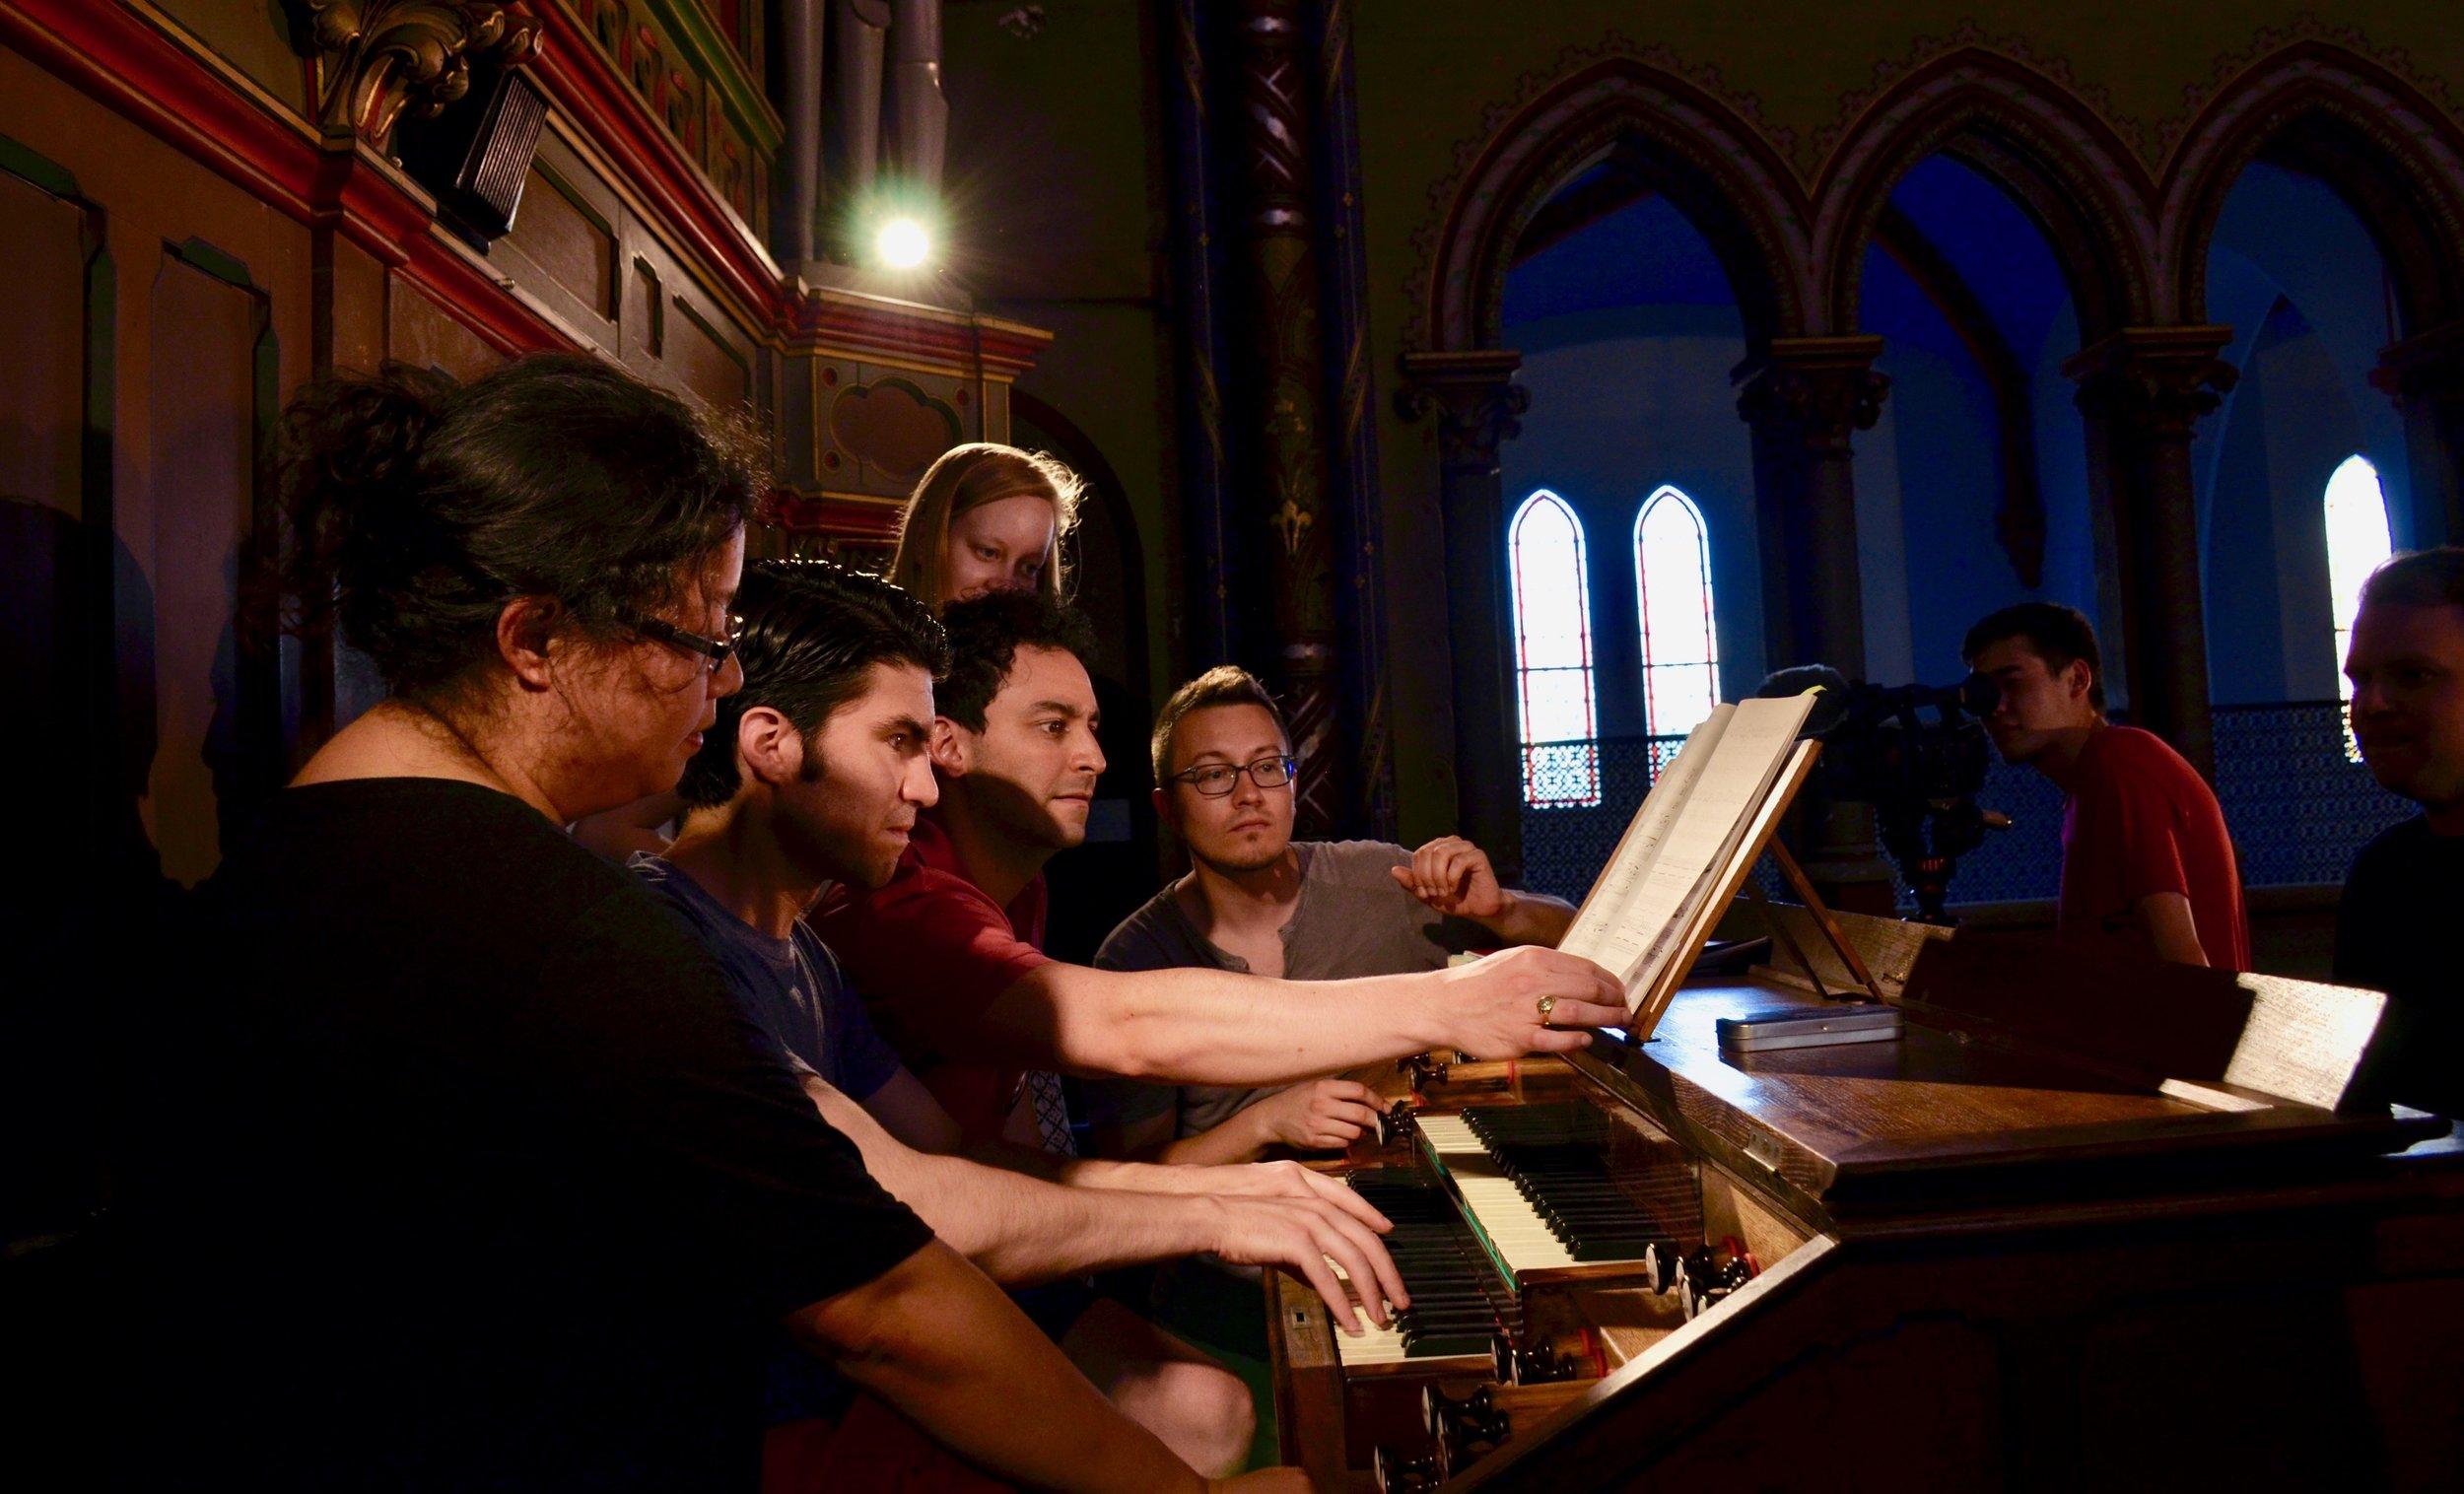 Members of Boston Organ Studio try out the organ in Gésu Church